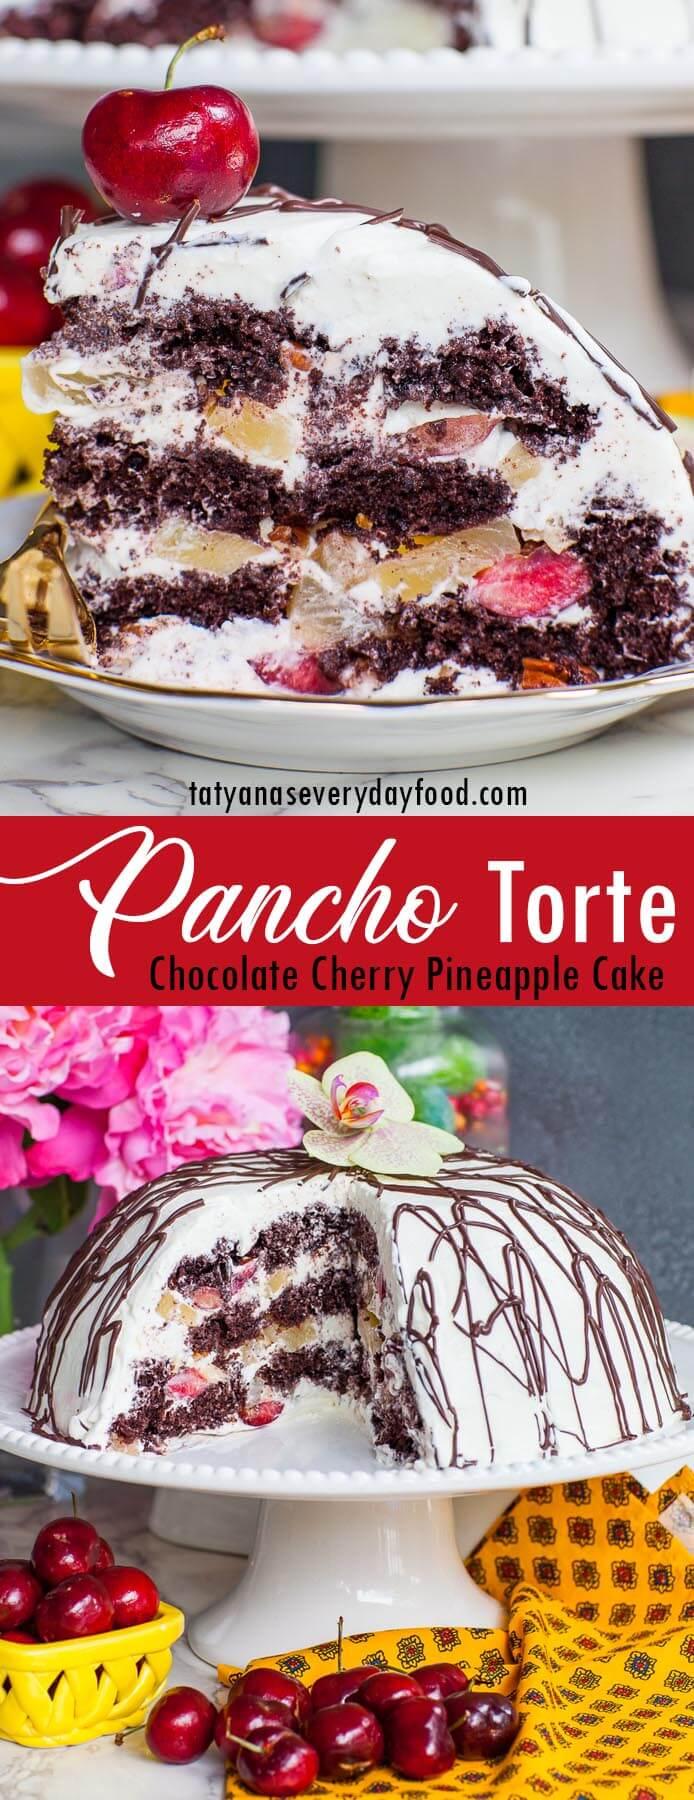 Pancho Torte video recipe